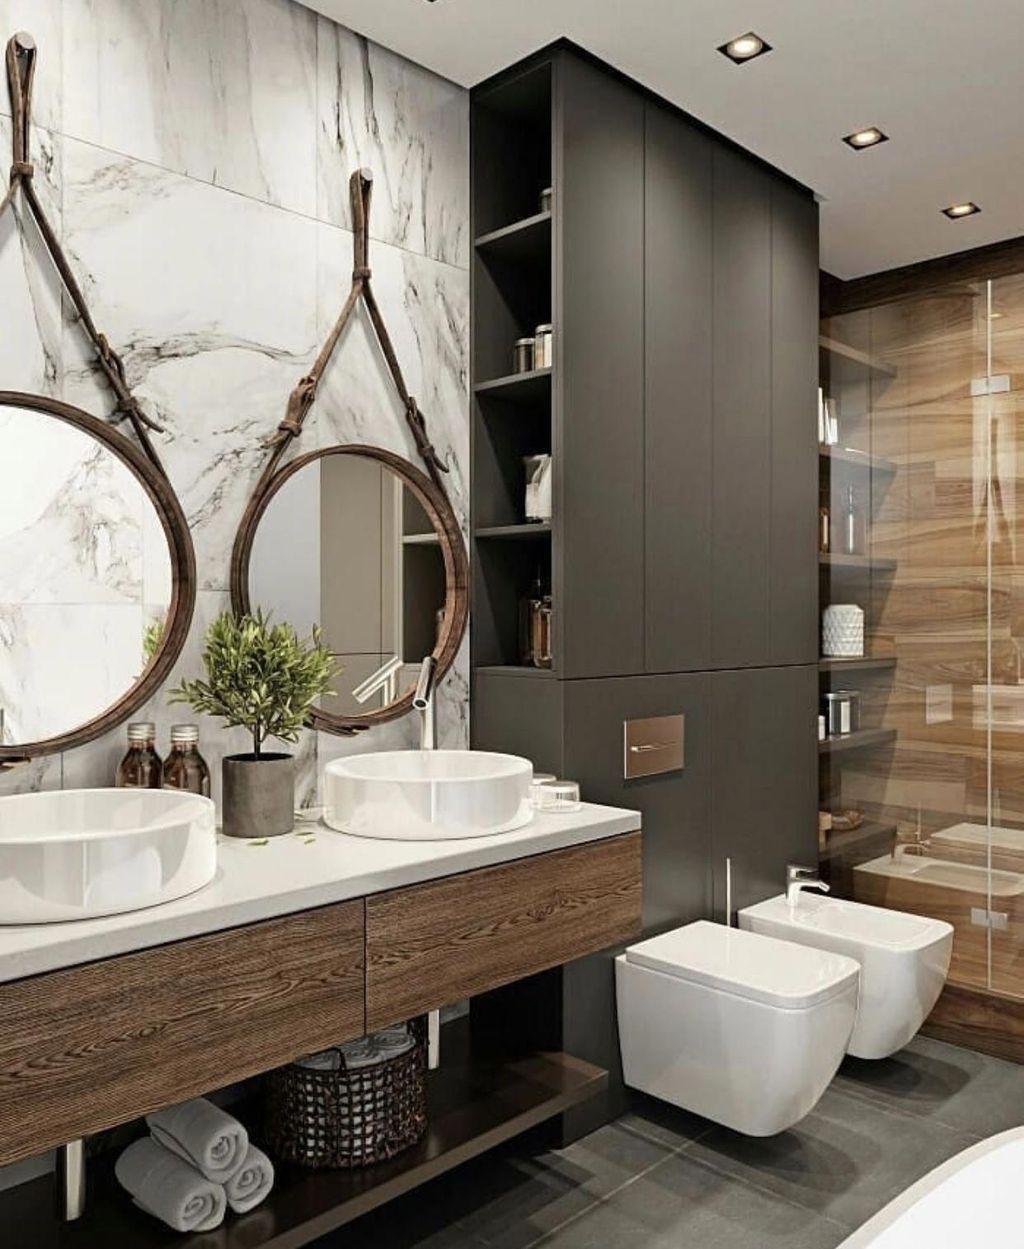 Bathroom Design Ideas Industrial Stunning 32 Stunning Industrial Bathroom D In 2020 Industrial Bathroom Design Industrial Style Bathroom Industrial Bathroom Decor